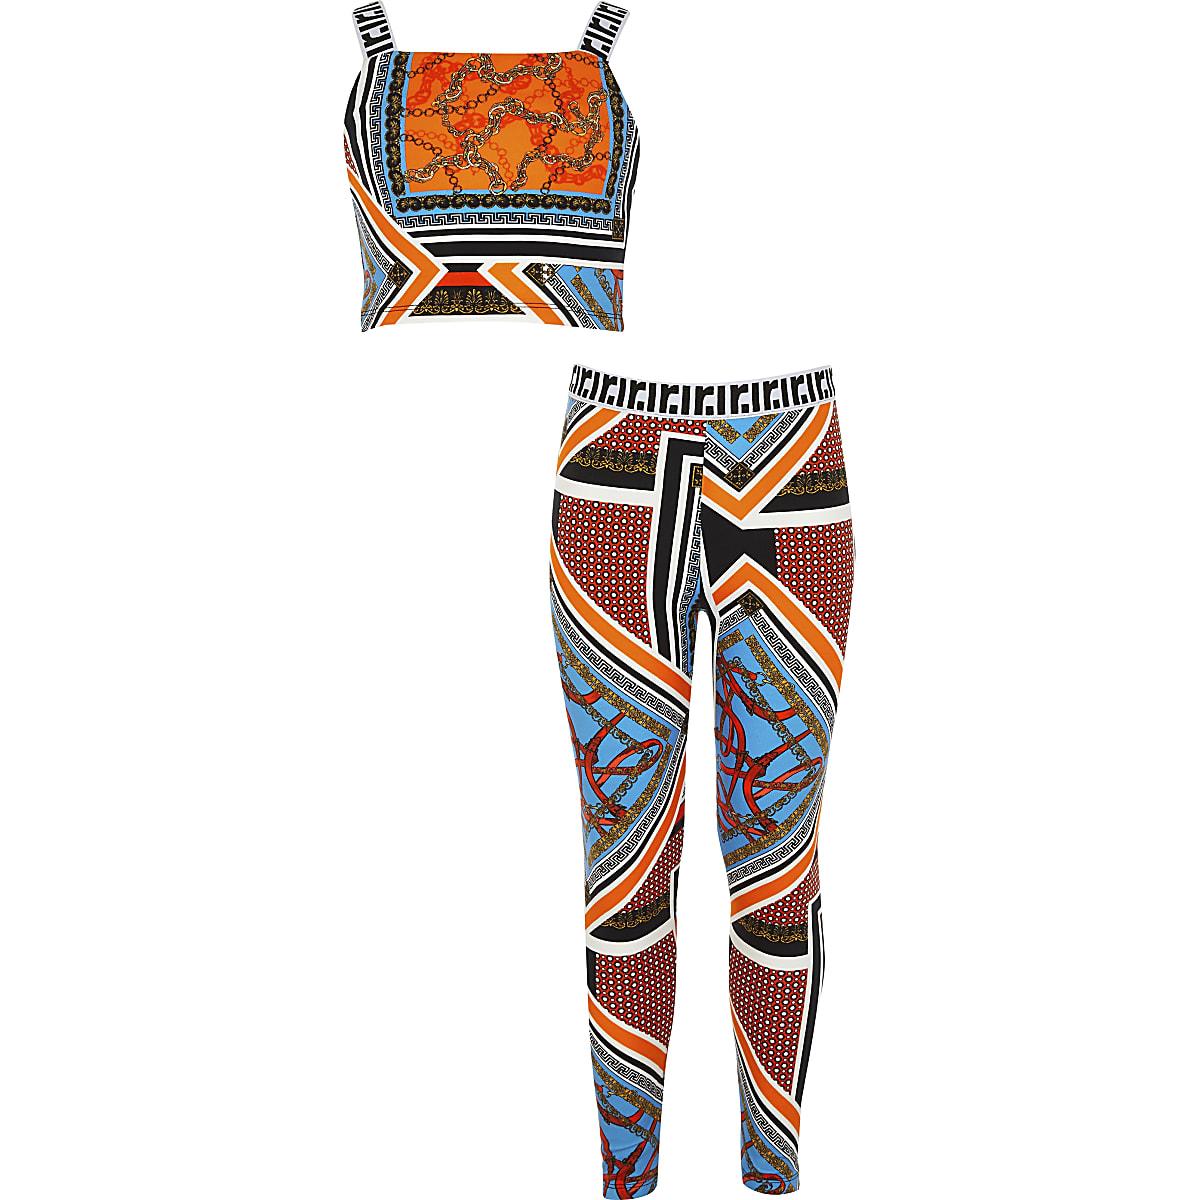 Girls orange baroque crop top outfit